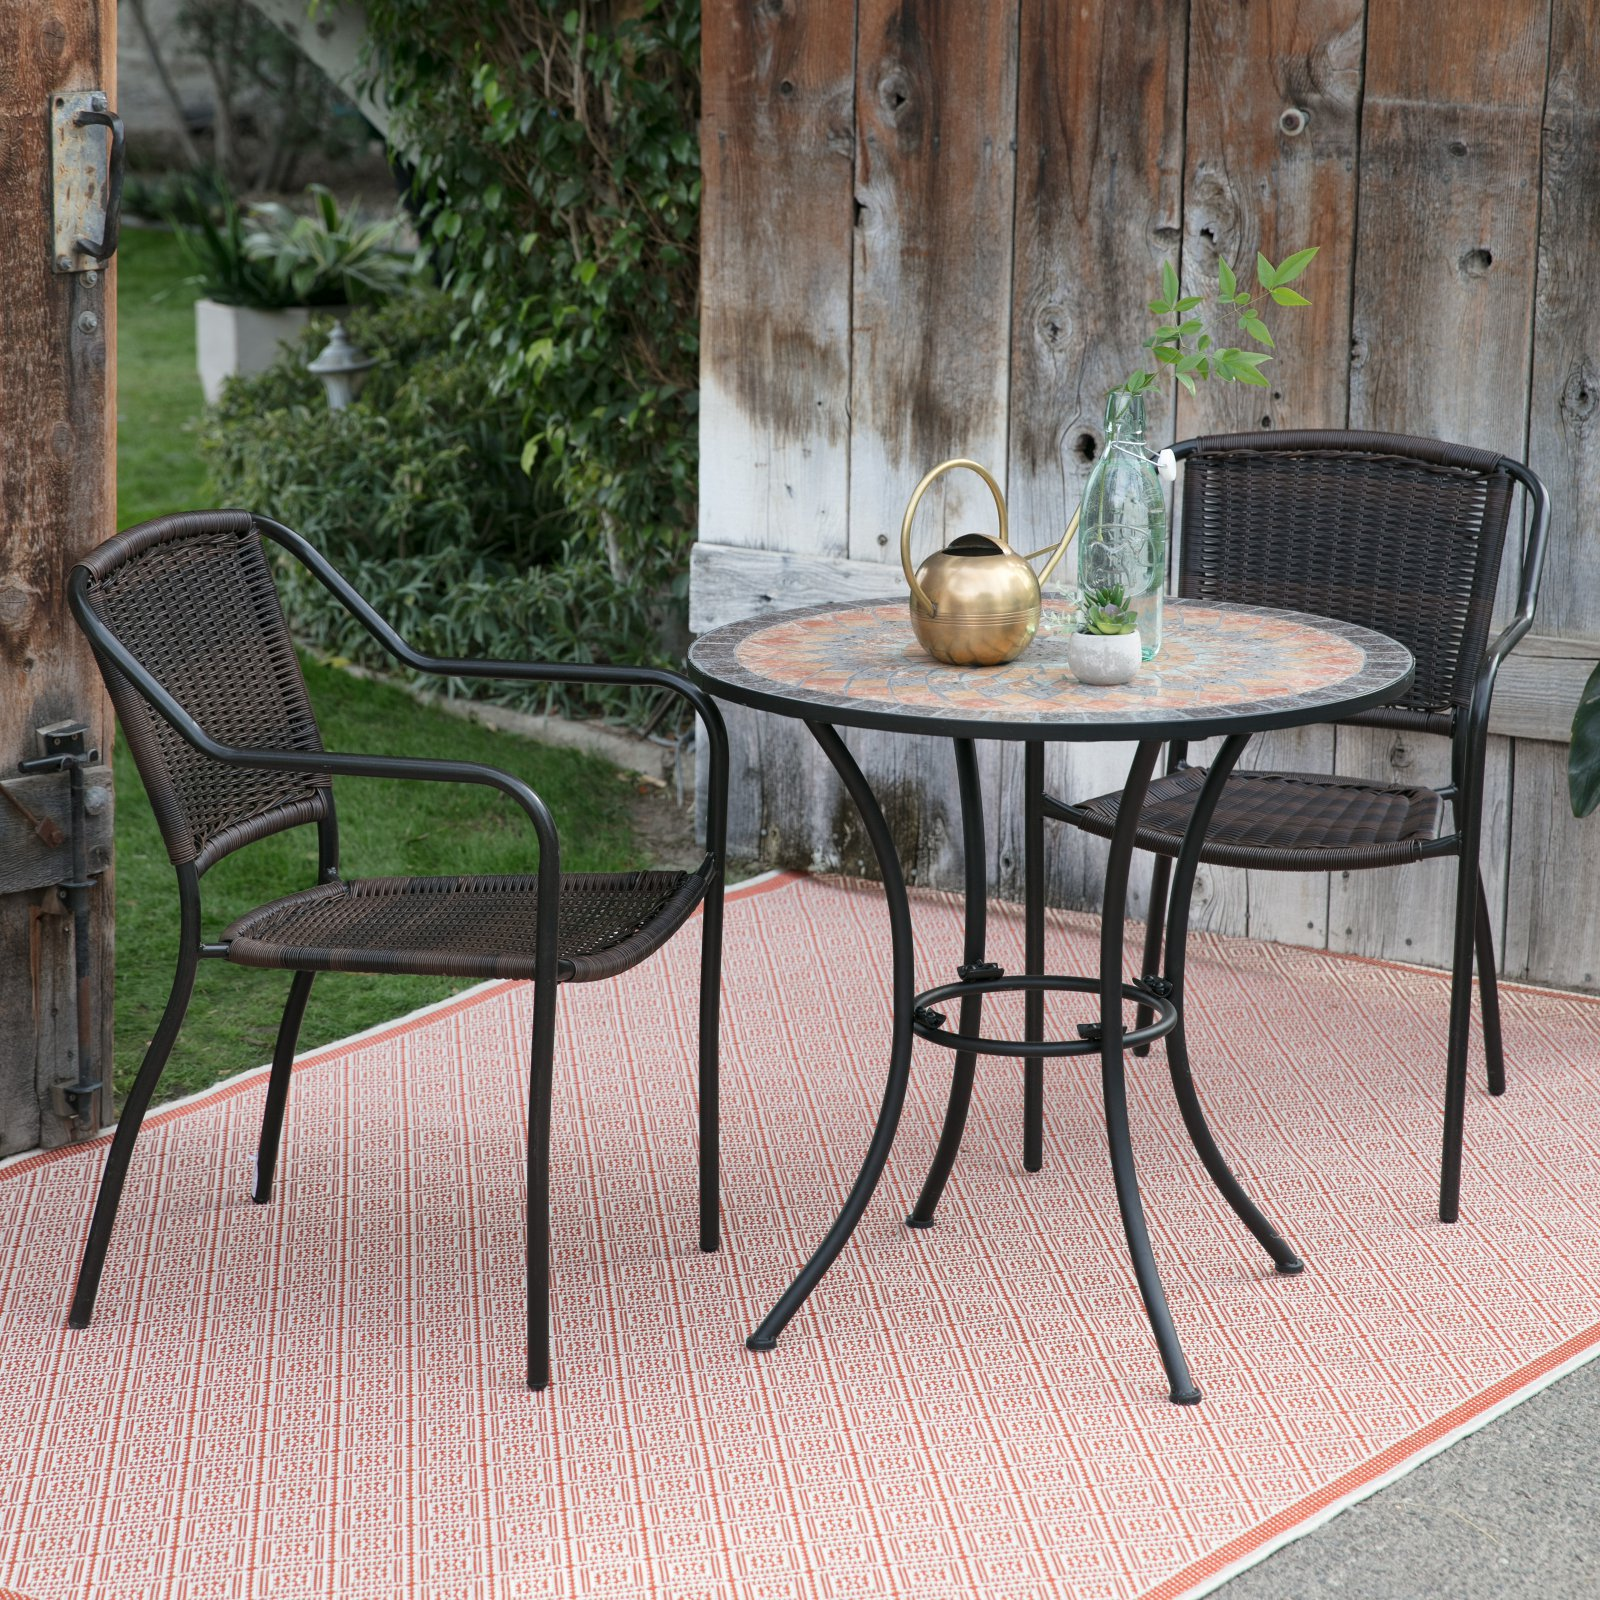 Coral Coast Santa Cruz Bistro Chair with Solita Mosaic Table